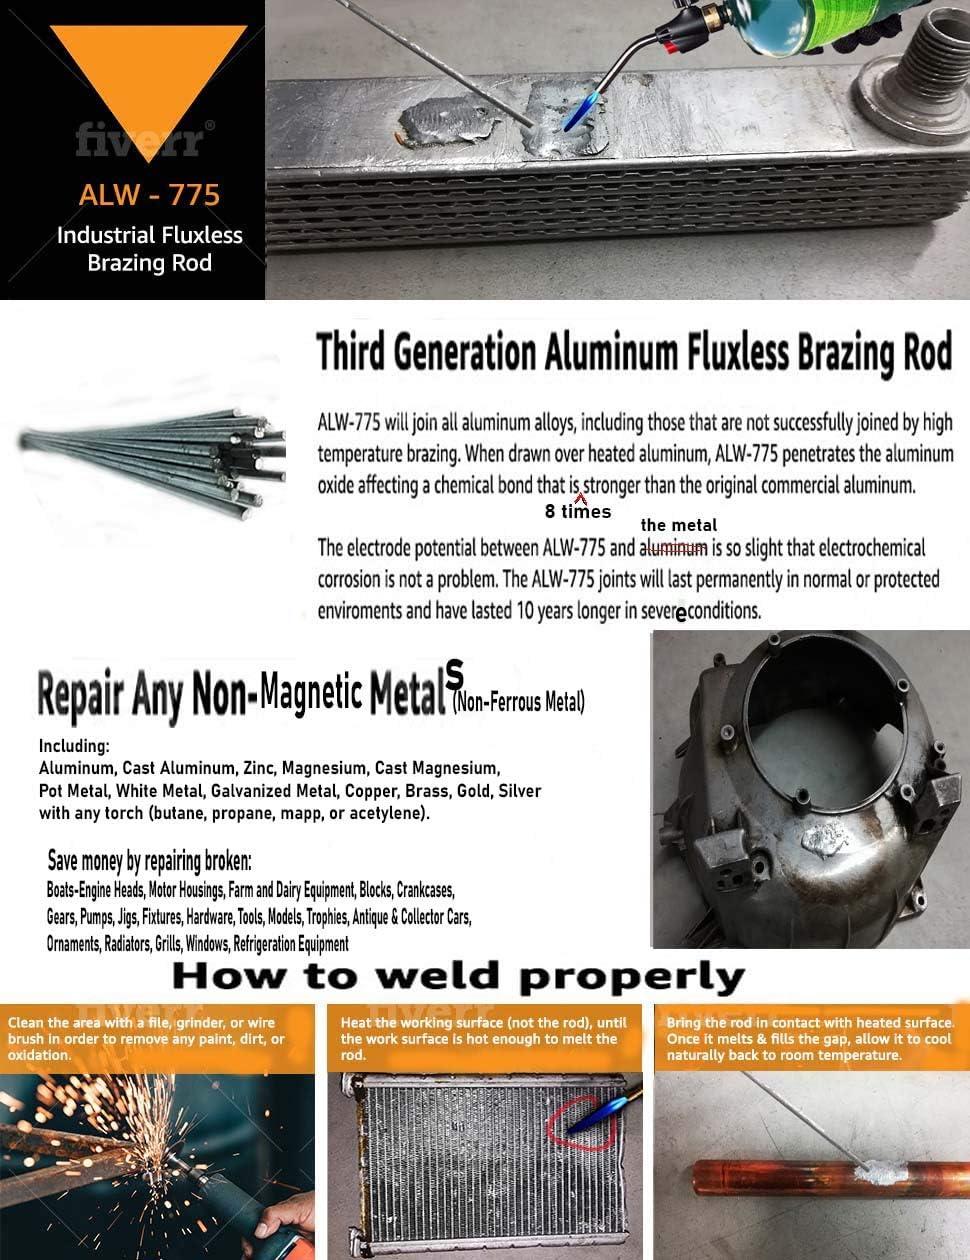 ALUMINUM FLUXLESS 5 PC.18 BRAZING RODS WELDING RODS REPAIR NON FERROUS NON MAGNETIC METAL